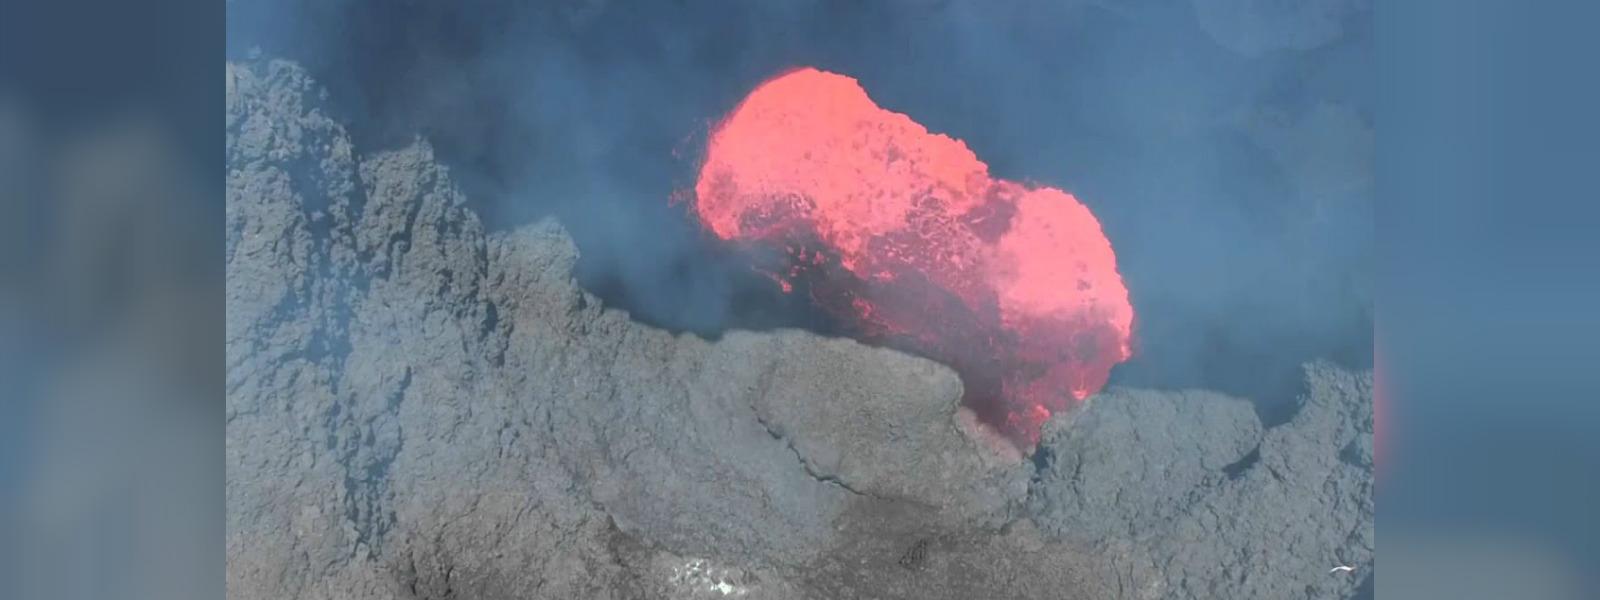 Bolivia suffers ash fallout from Peru volcanic eruption